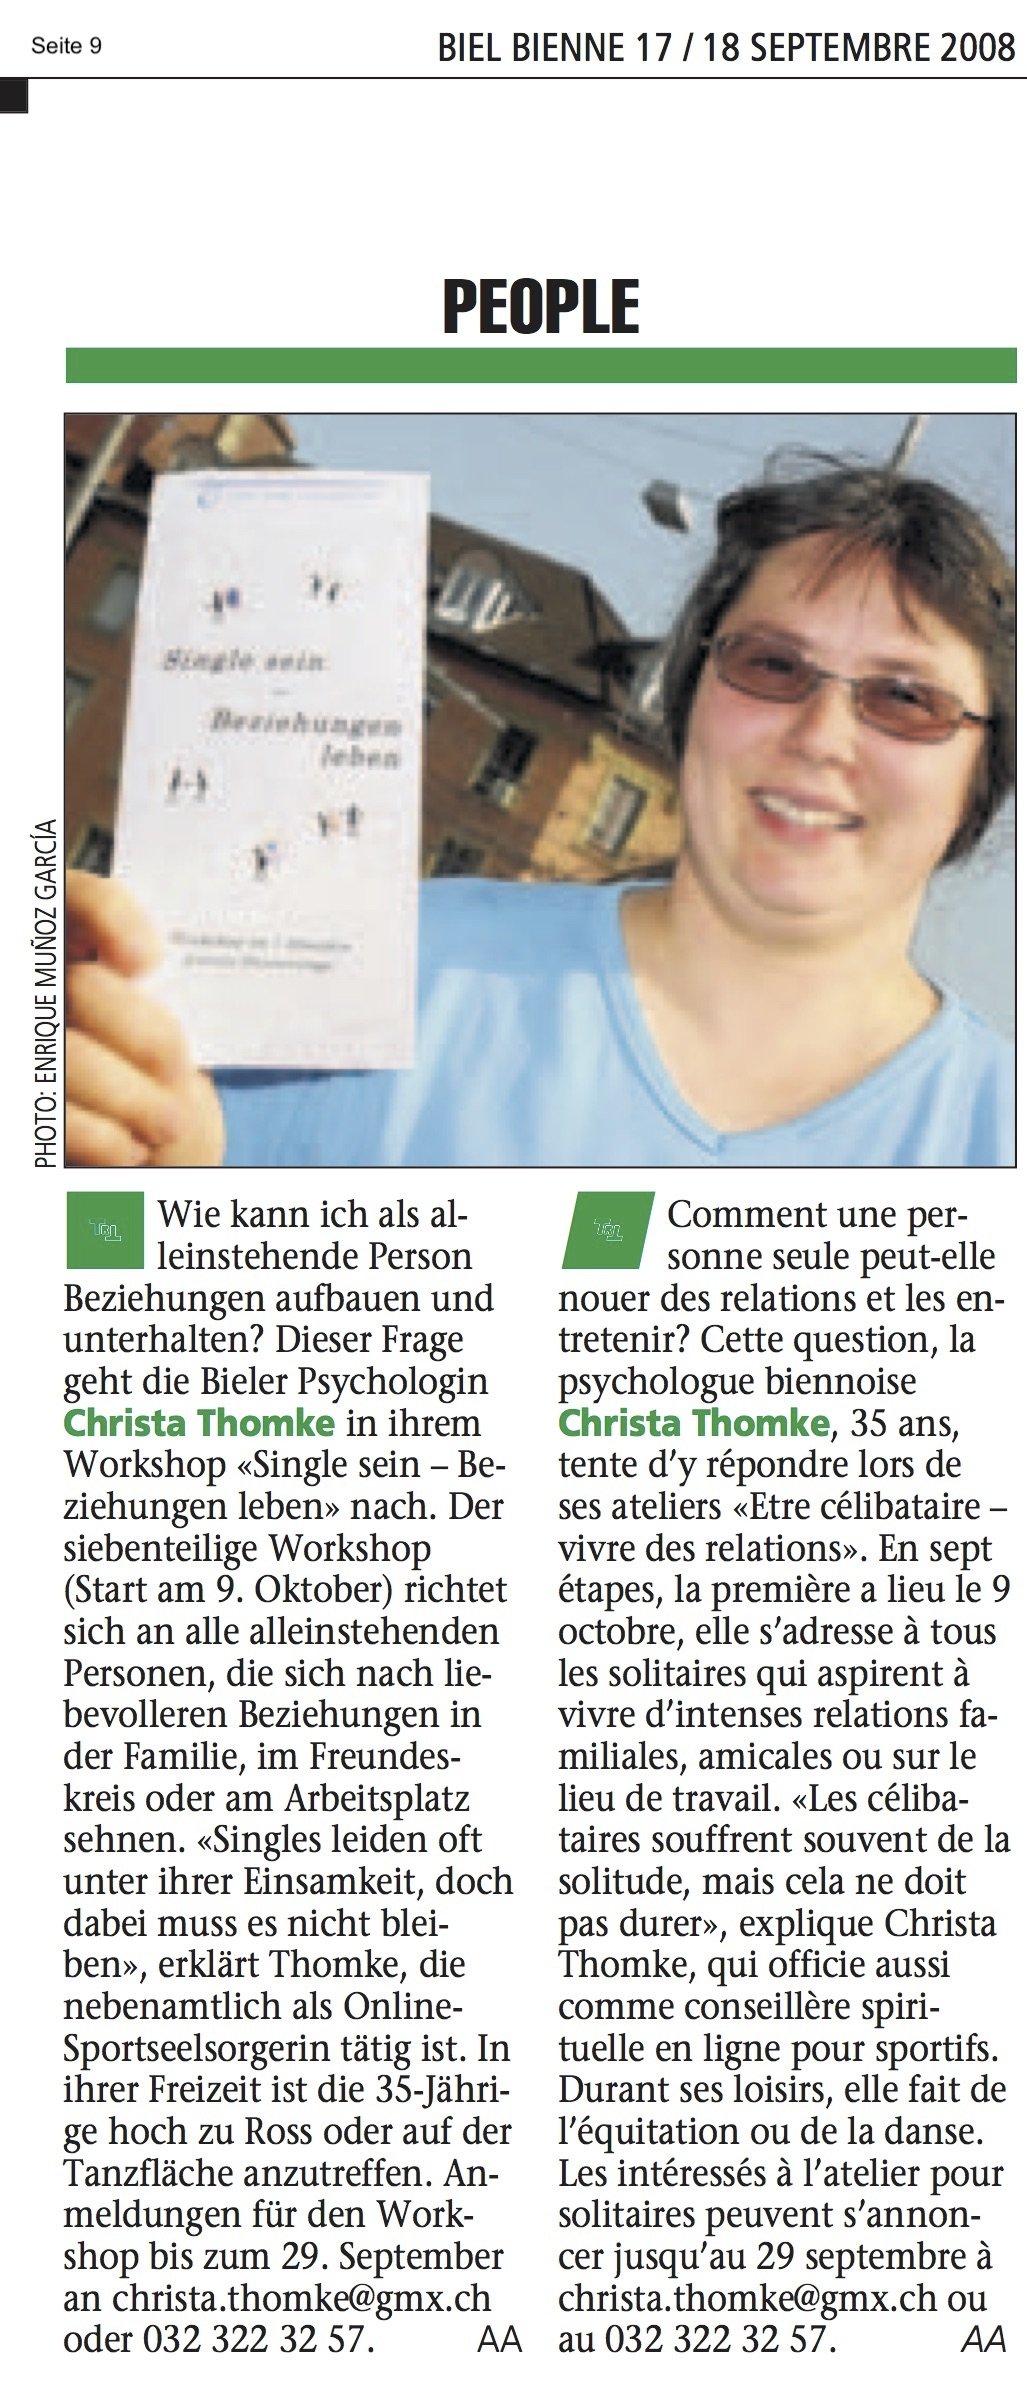 © Biel Bienne, 17. September 2008, S. 9